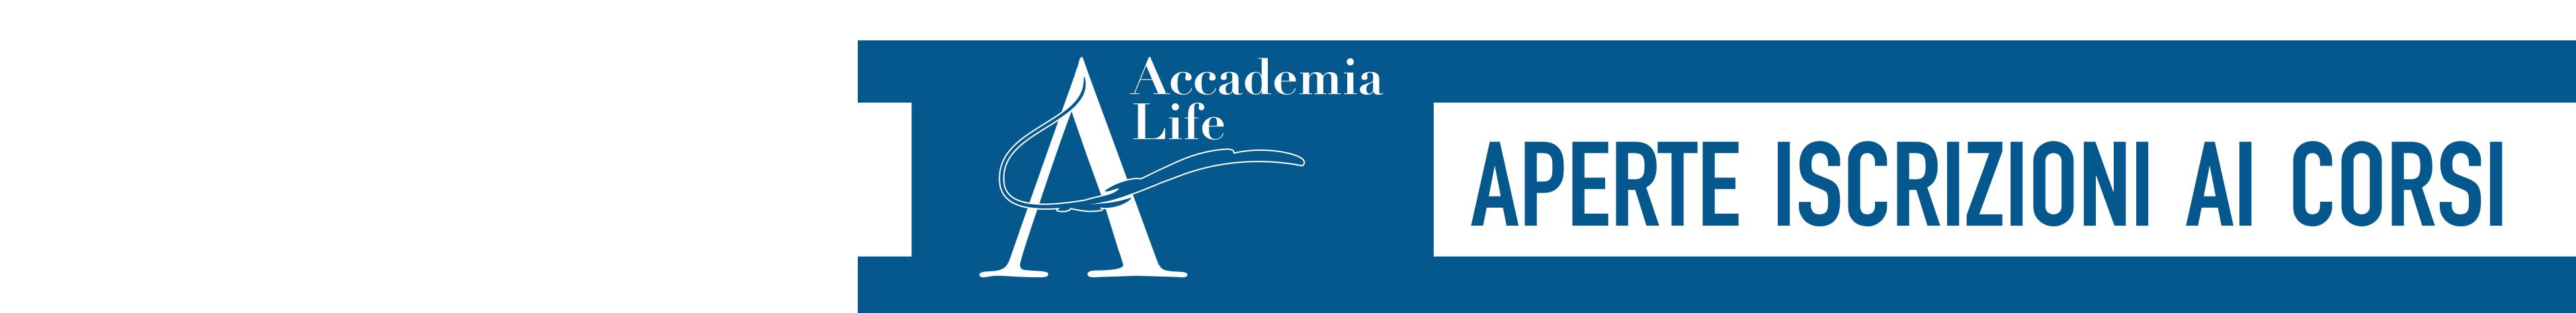 Accademia_nuovi_corsi